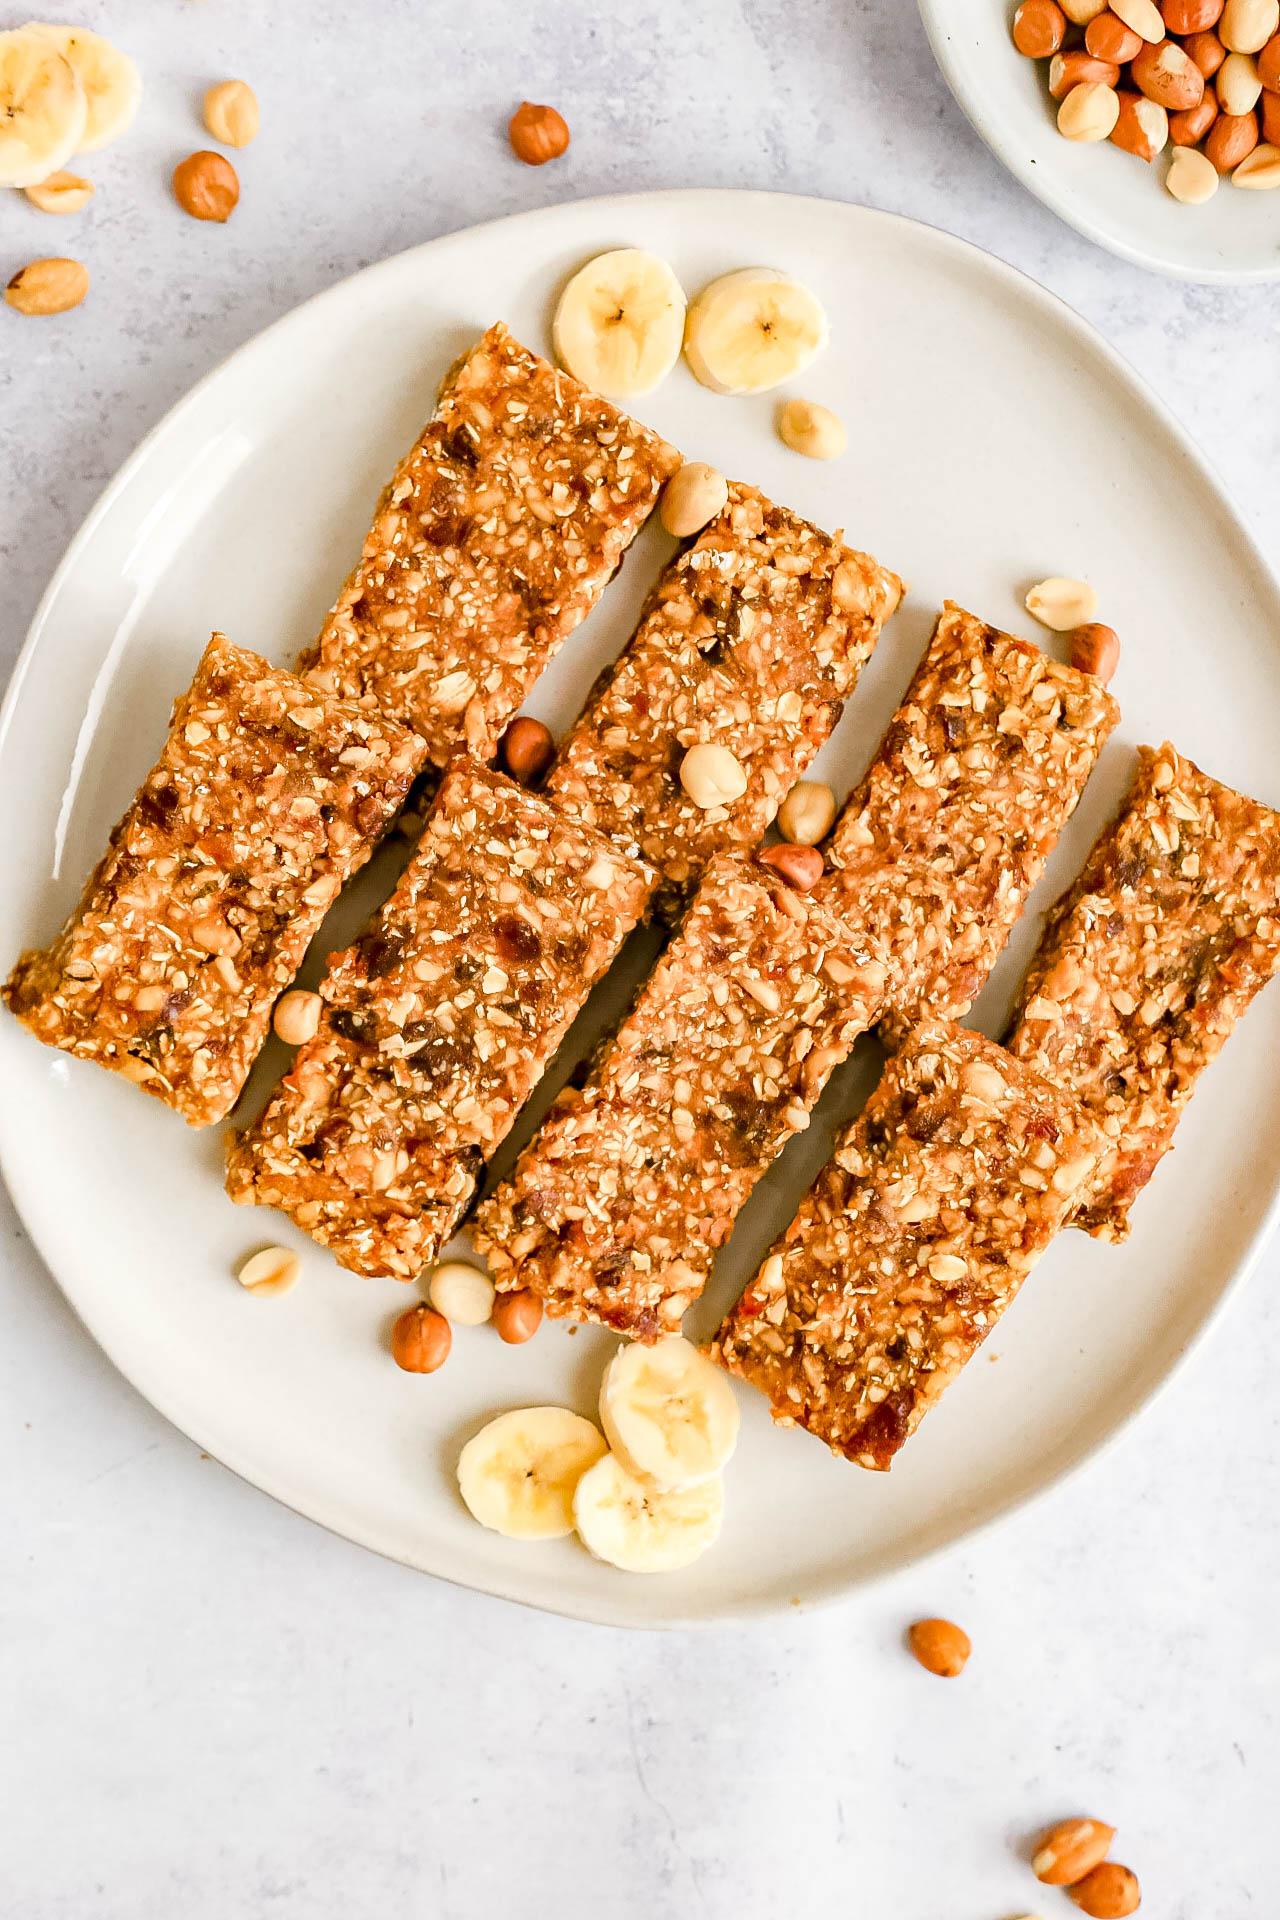 Peanut Butter Banana Breakfast Bars